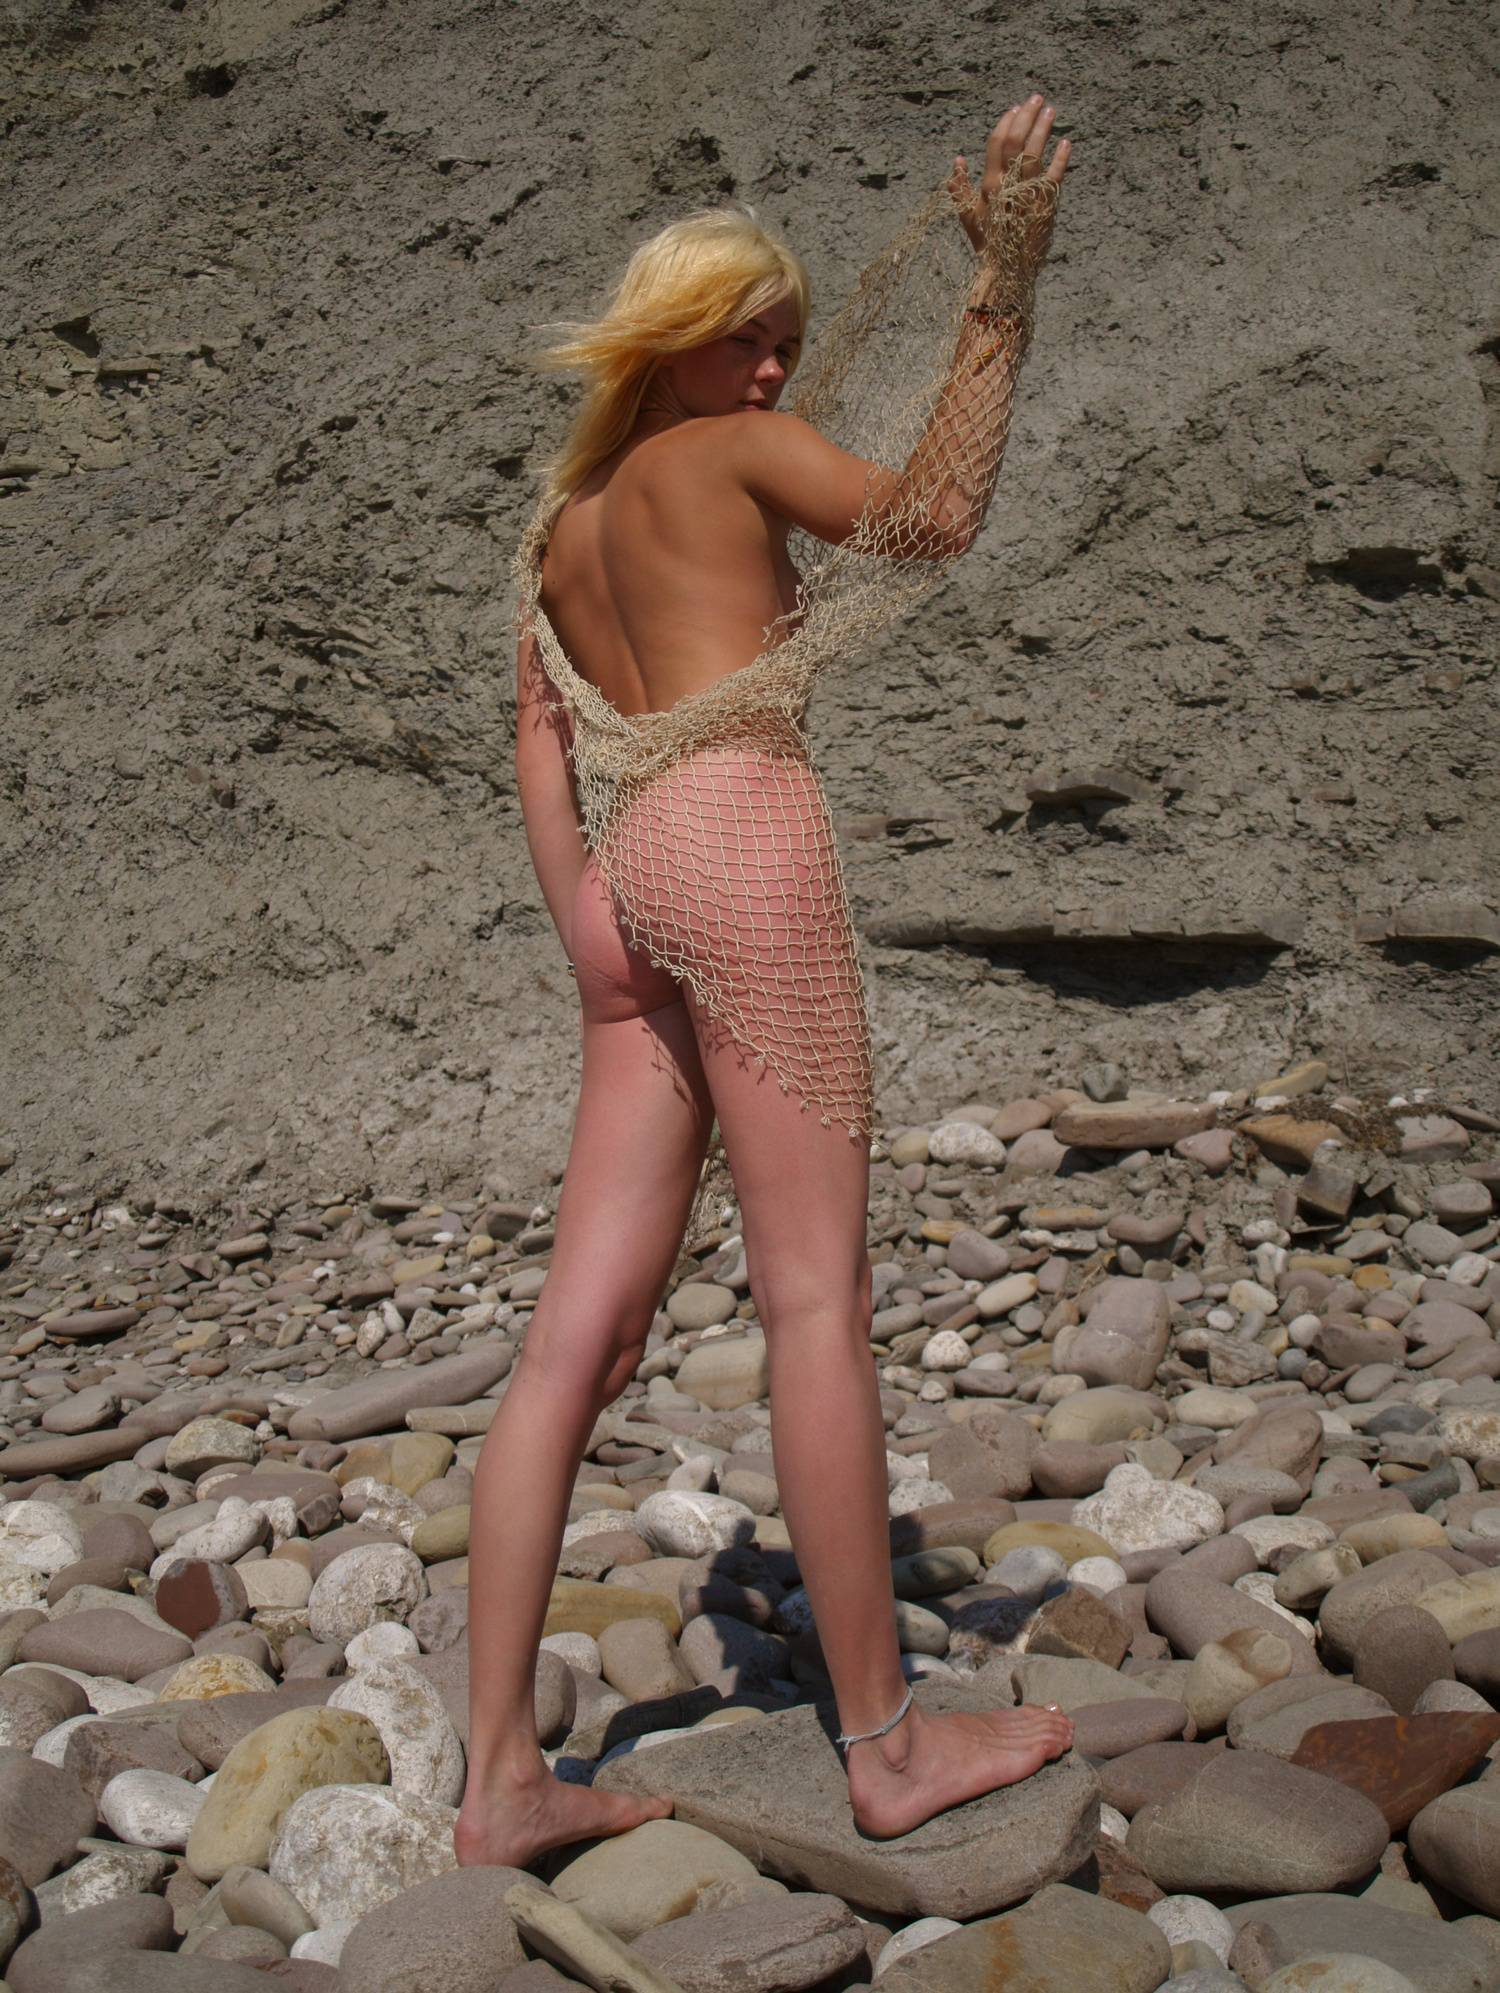 Pure Nudism Photos-Blonde Beach Rock Beauty - 2